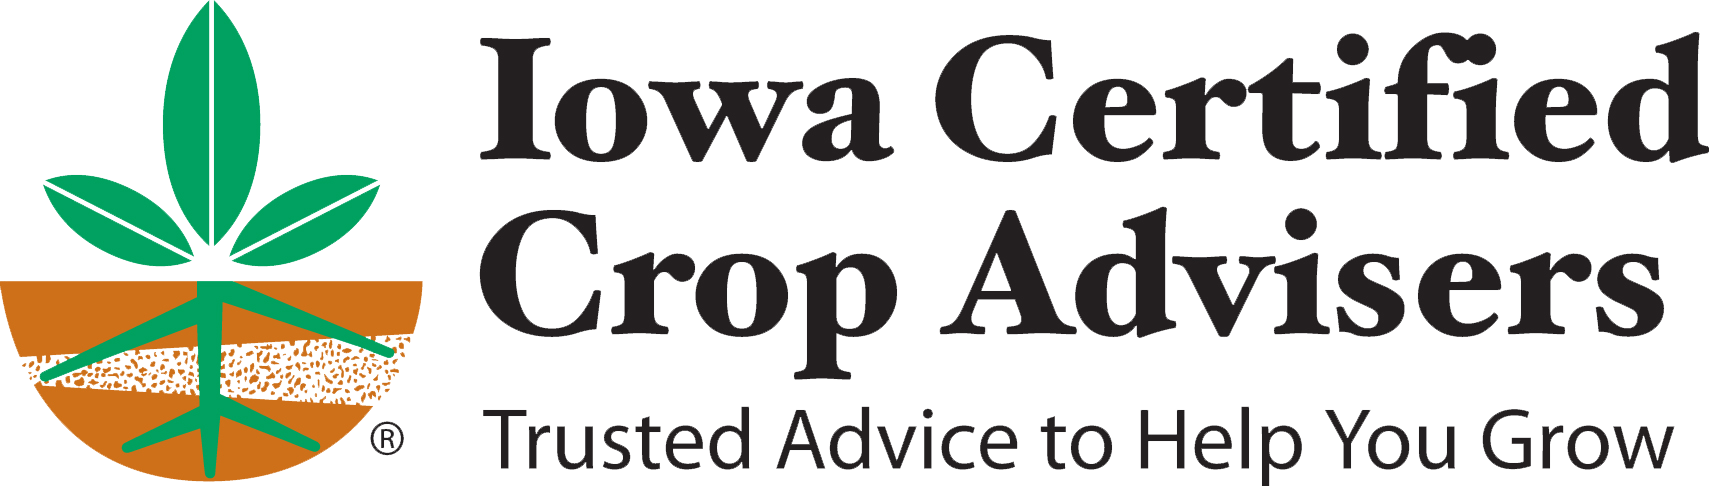 Iowa Certified Crop Adviser Program